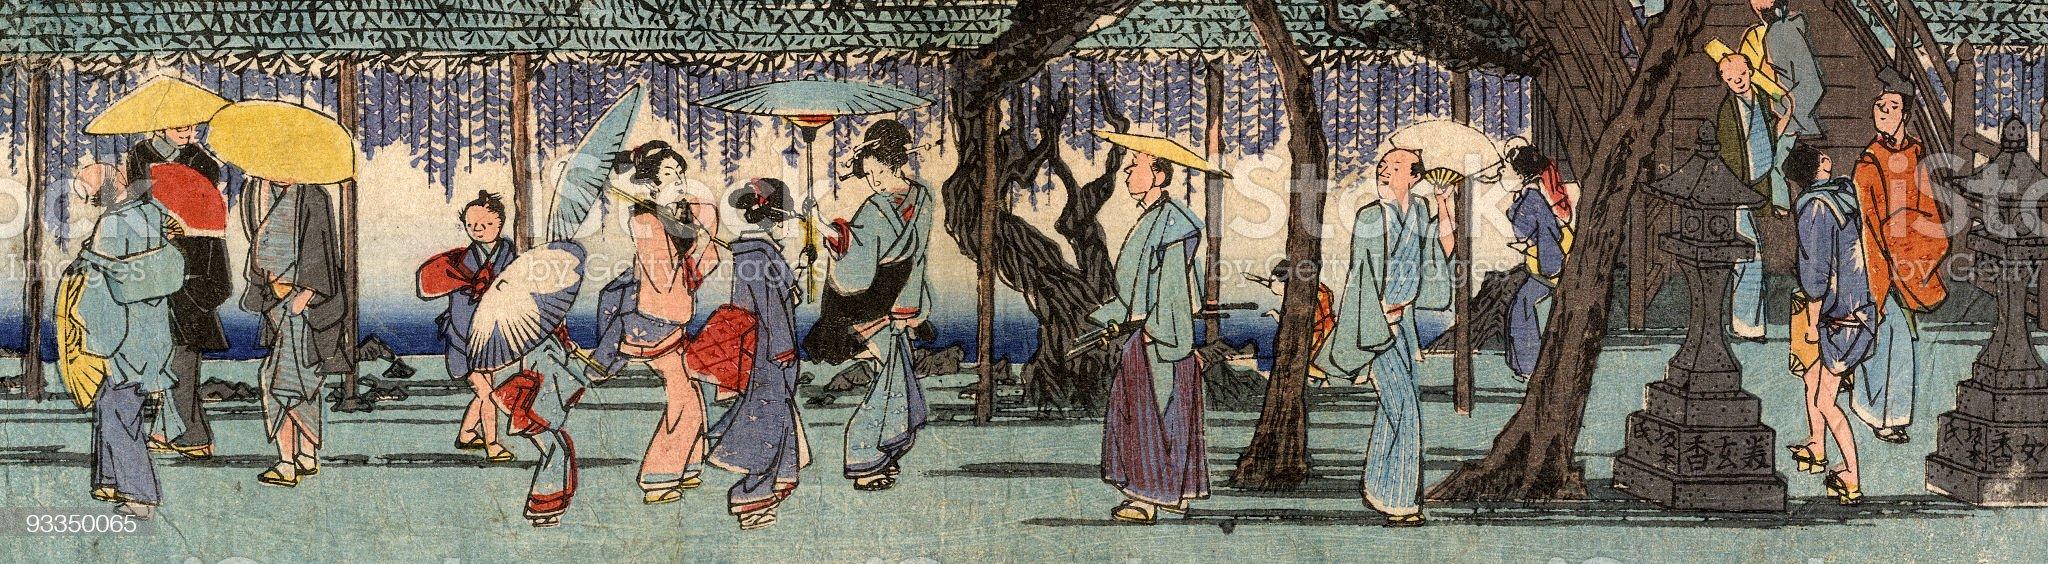 Japanese Woodblock Street Scene by Hiroshige royalty-free stock vector art